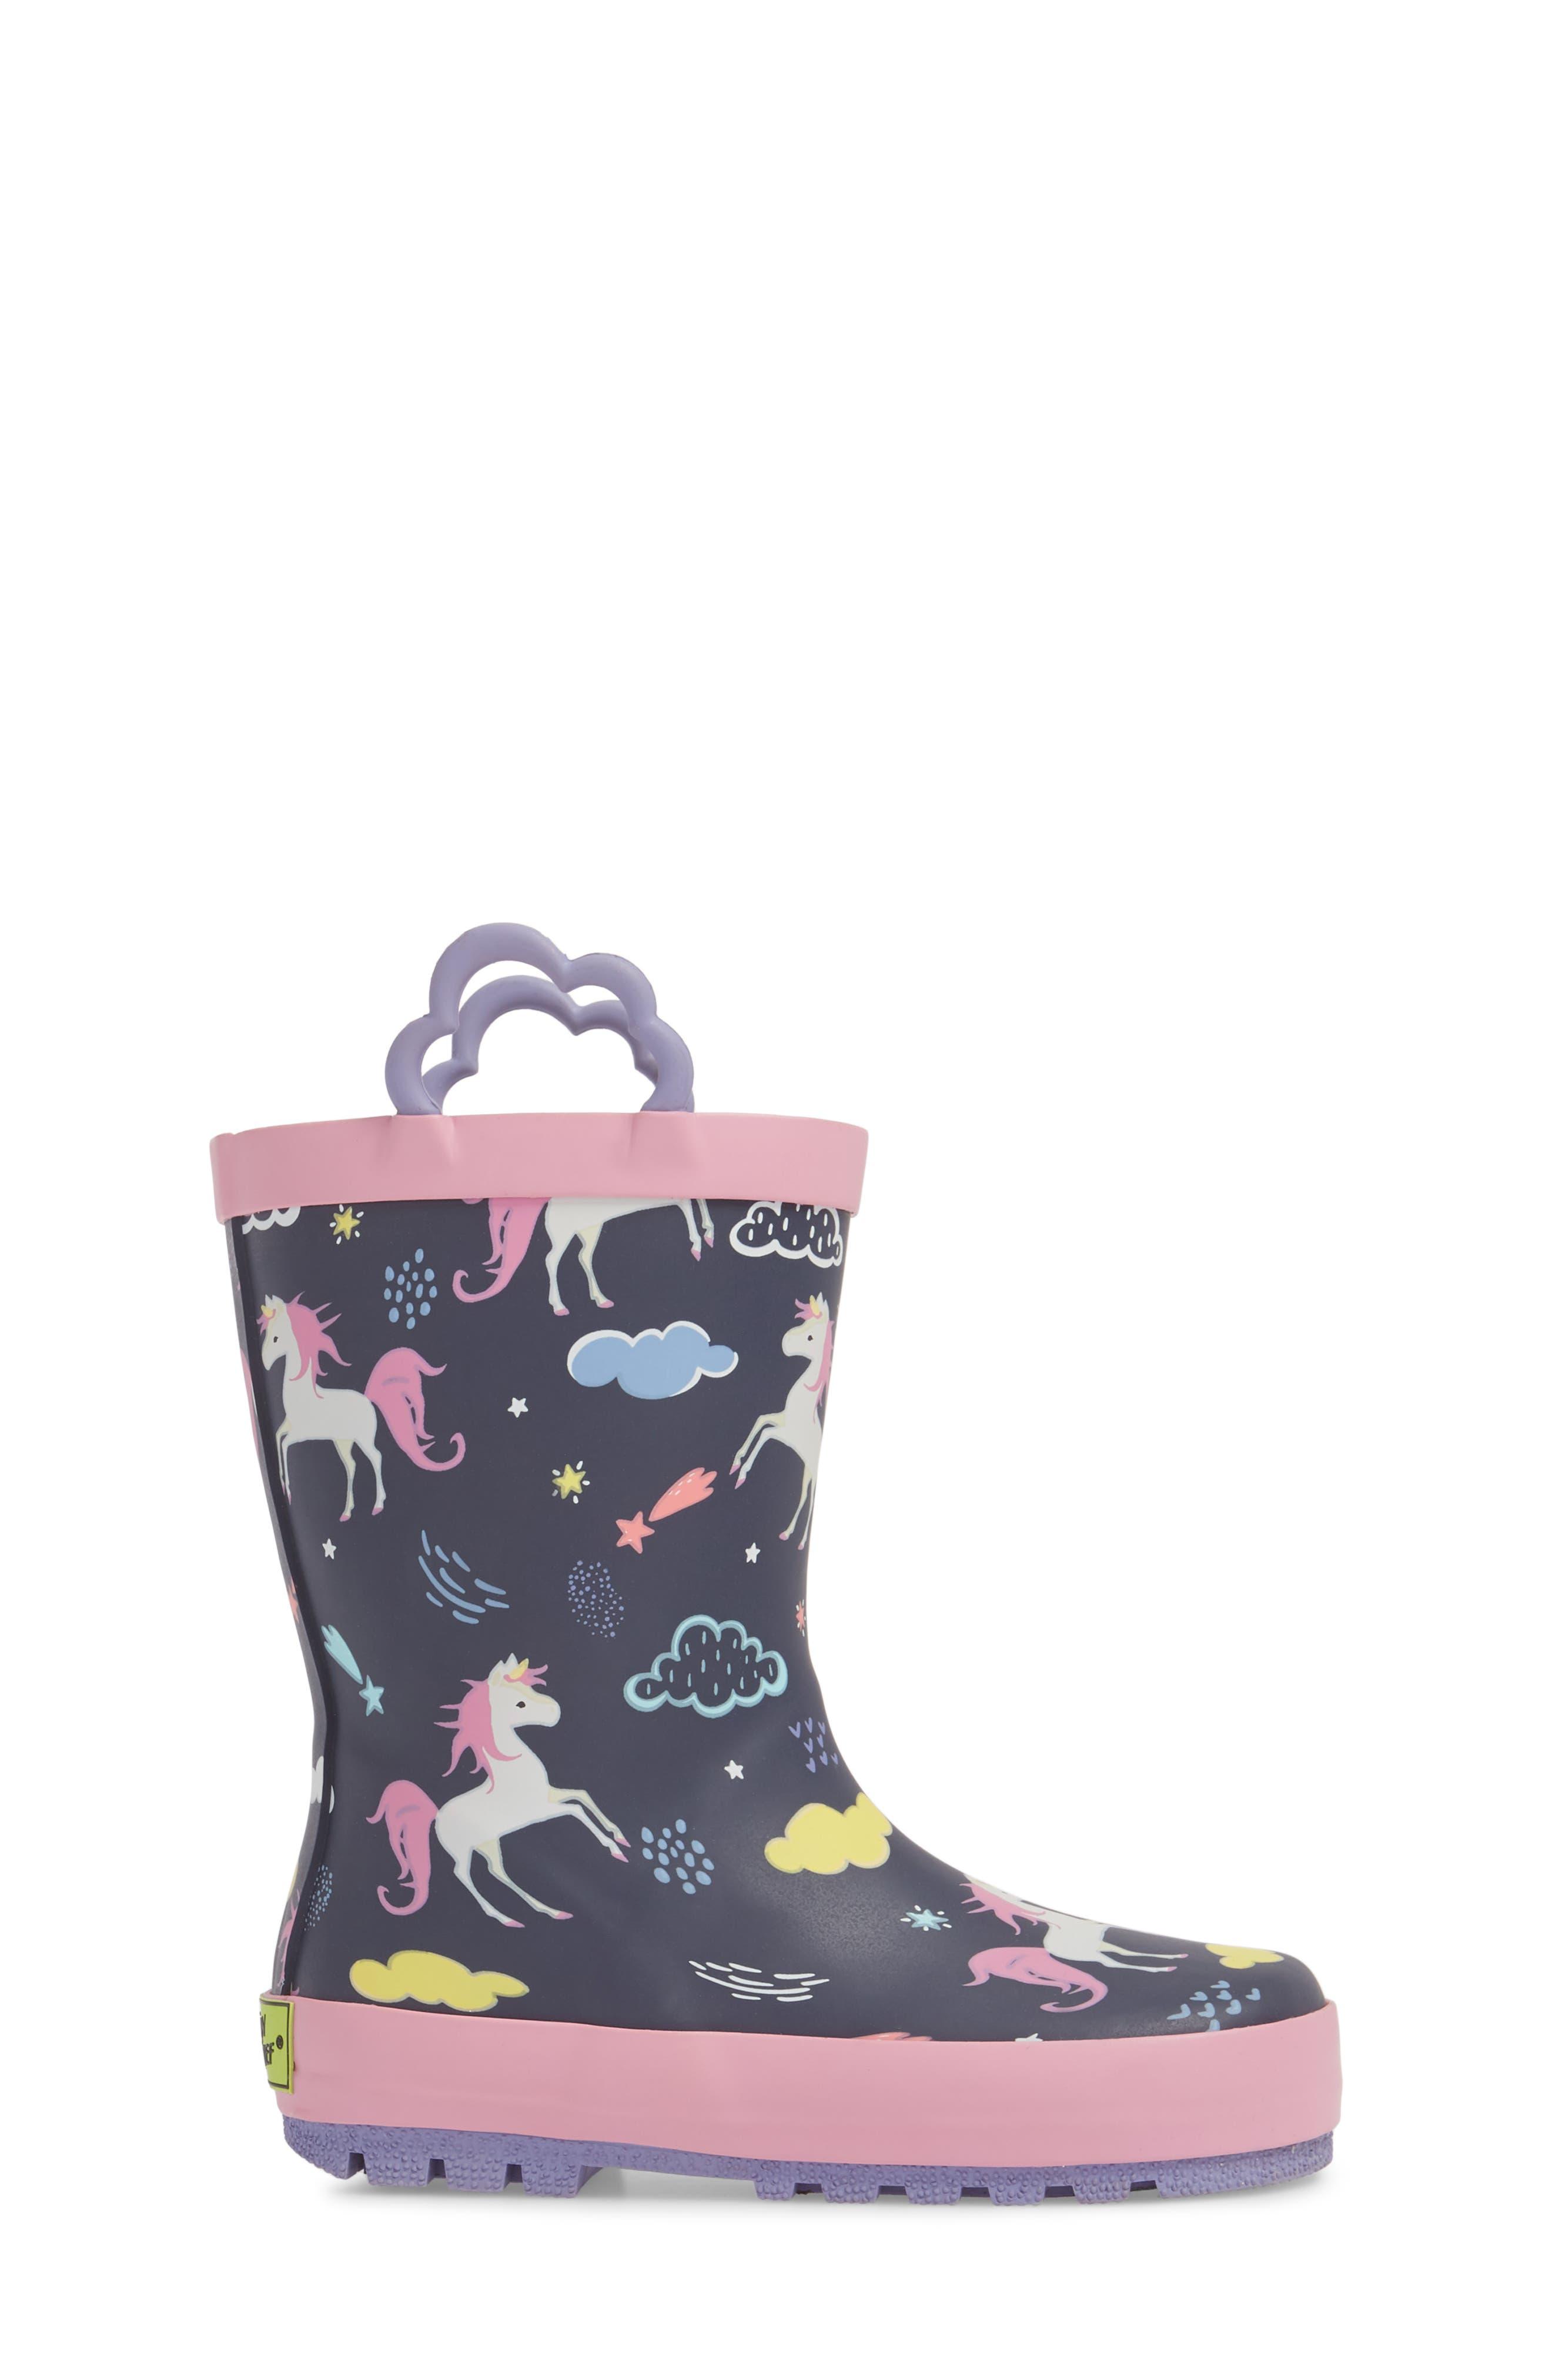 Unicorn Play Waterproof Rain Boot,                             Alternate thumbnail 3, color,                             421